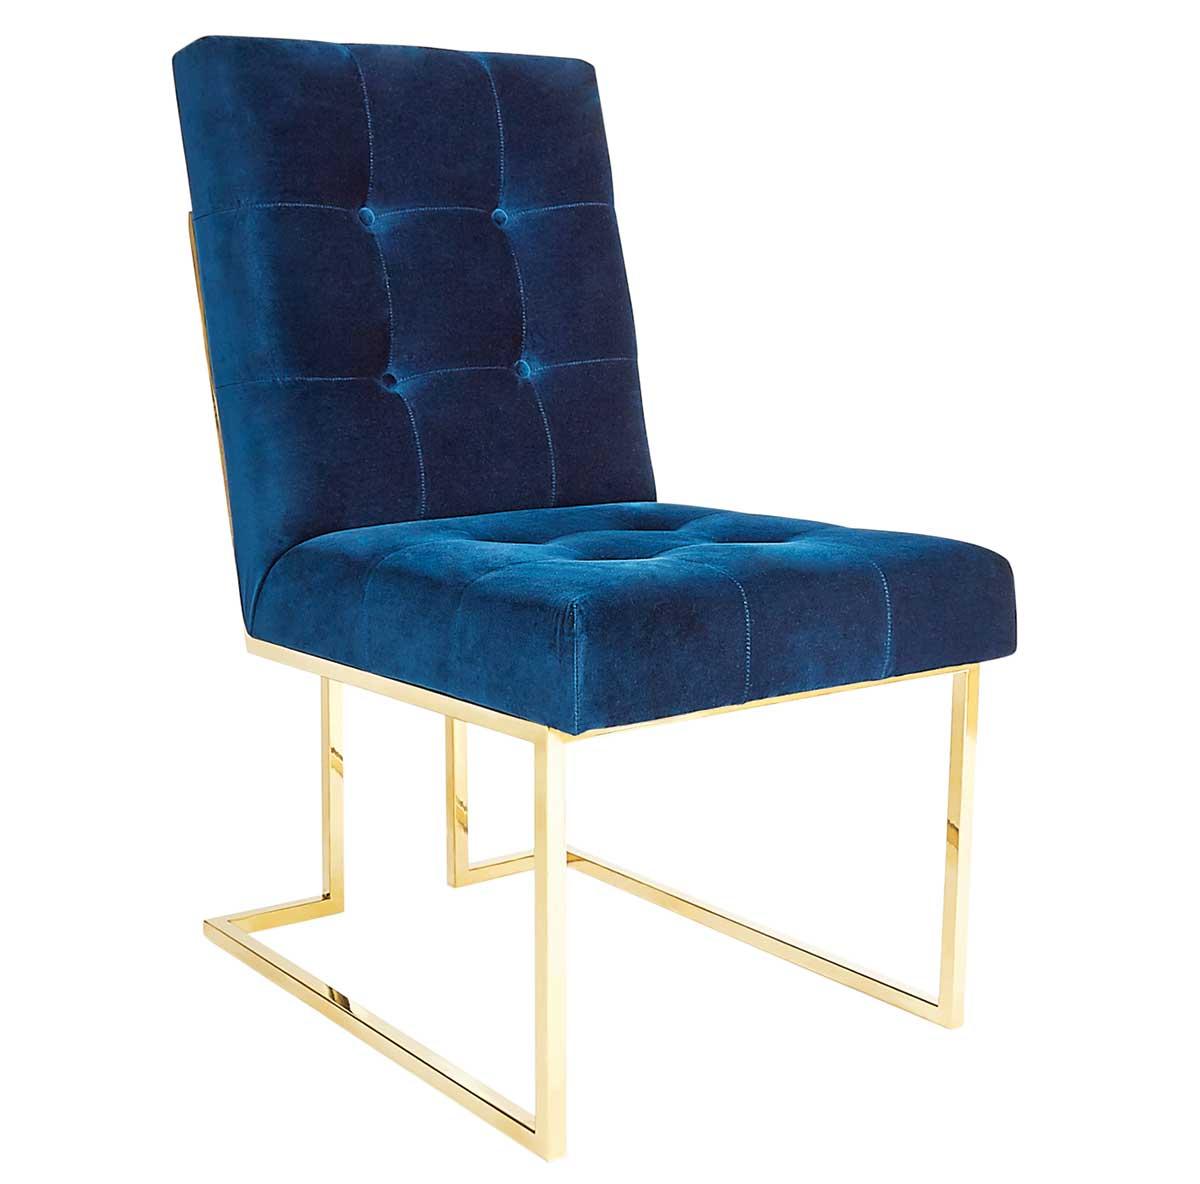 Goldfinger-dining-chair,-ed-pick-14